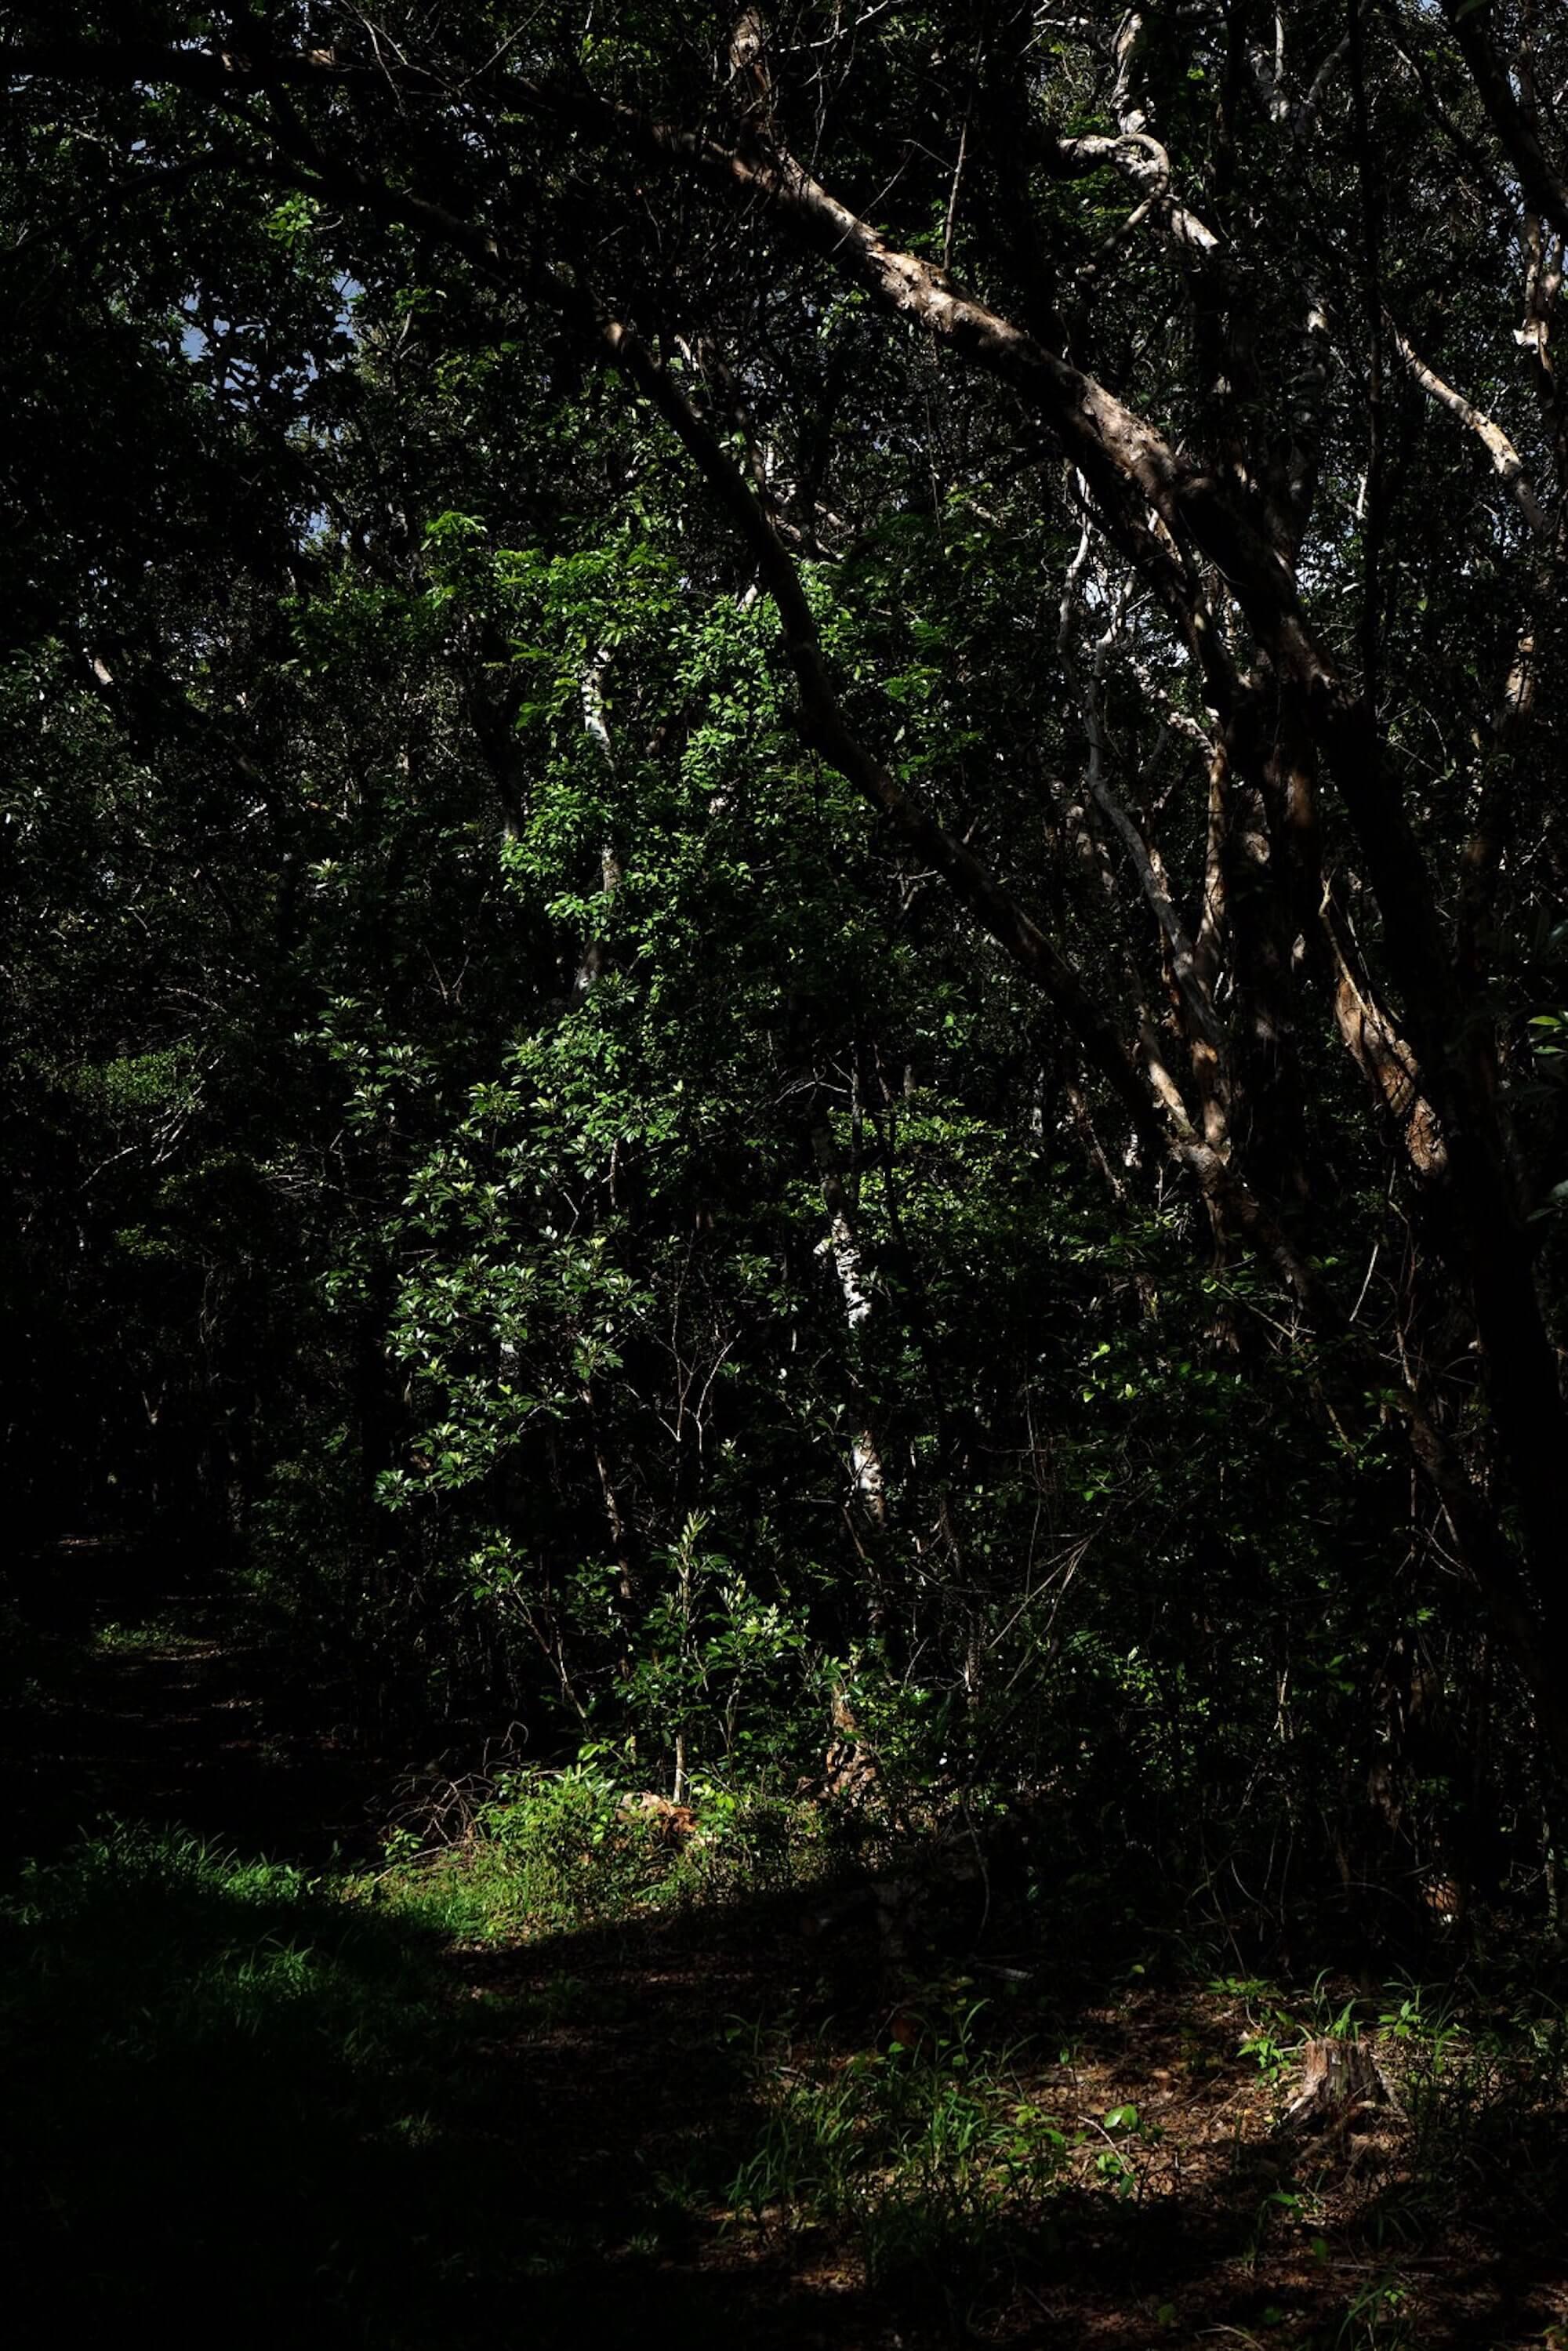 paysage sonore Sophie Marsq 1 (1)